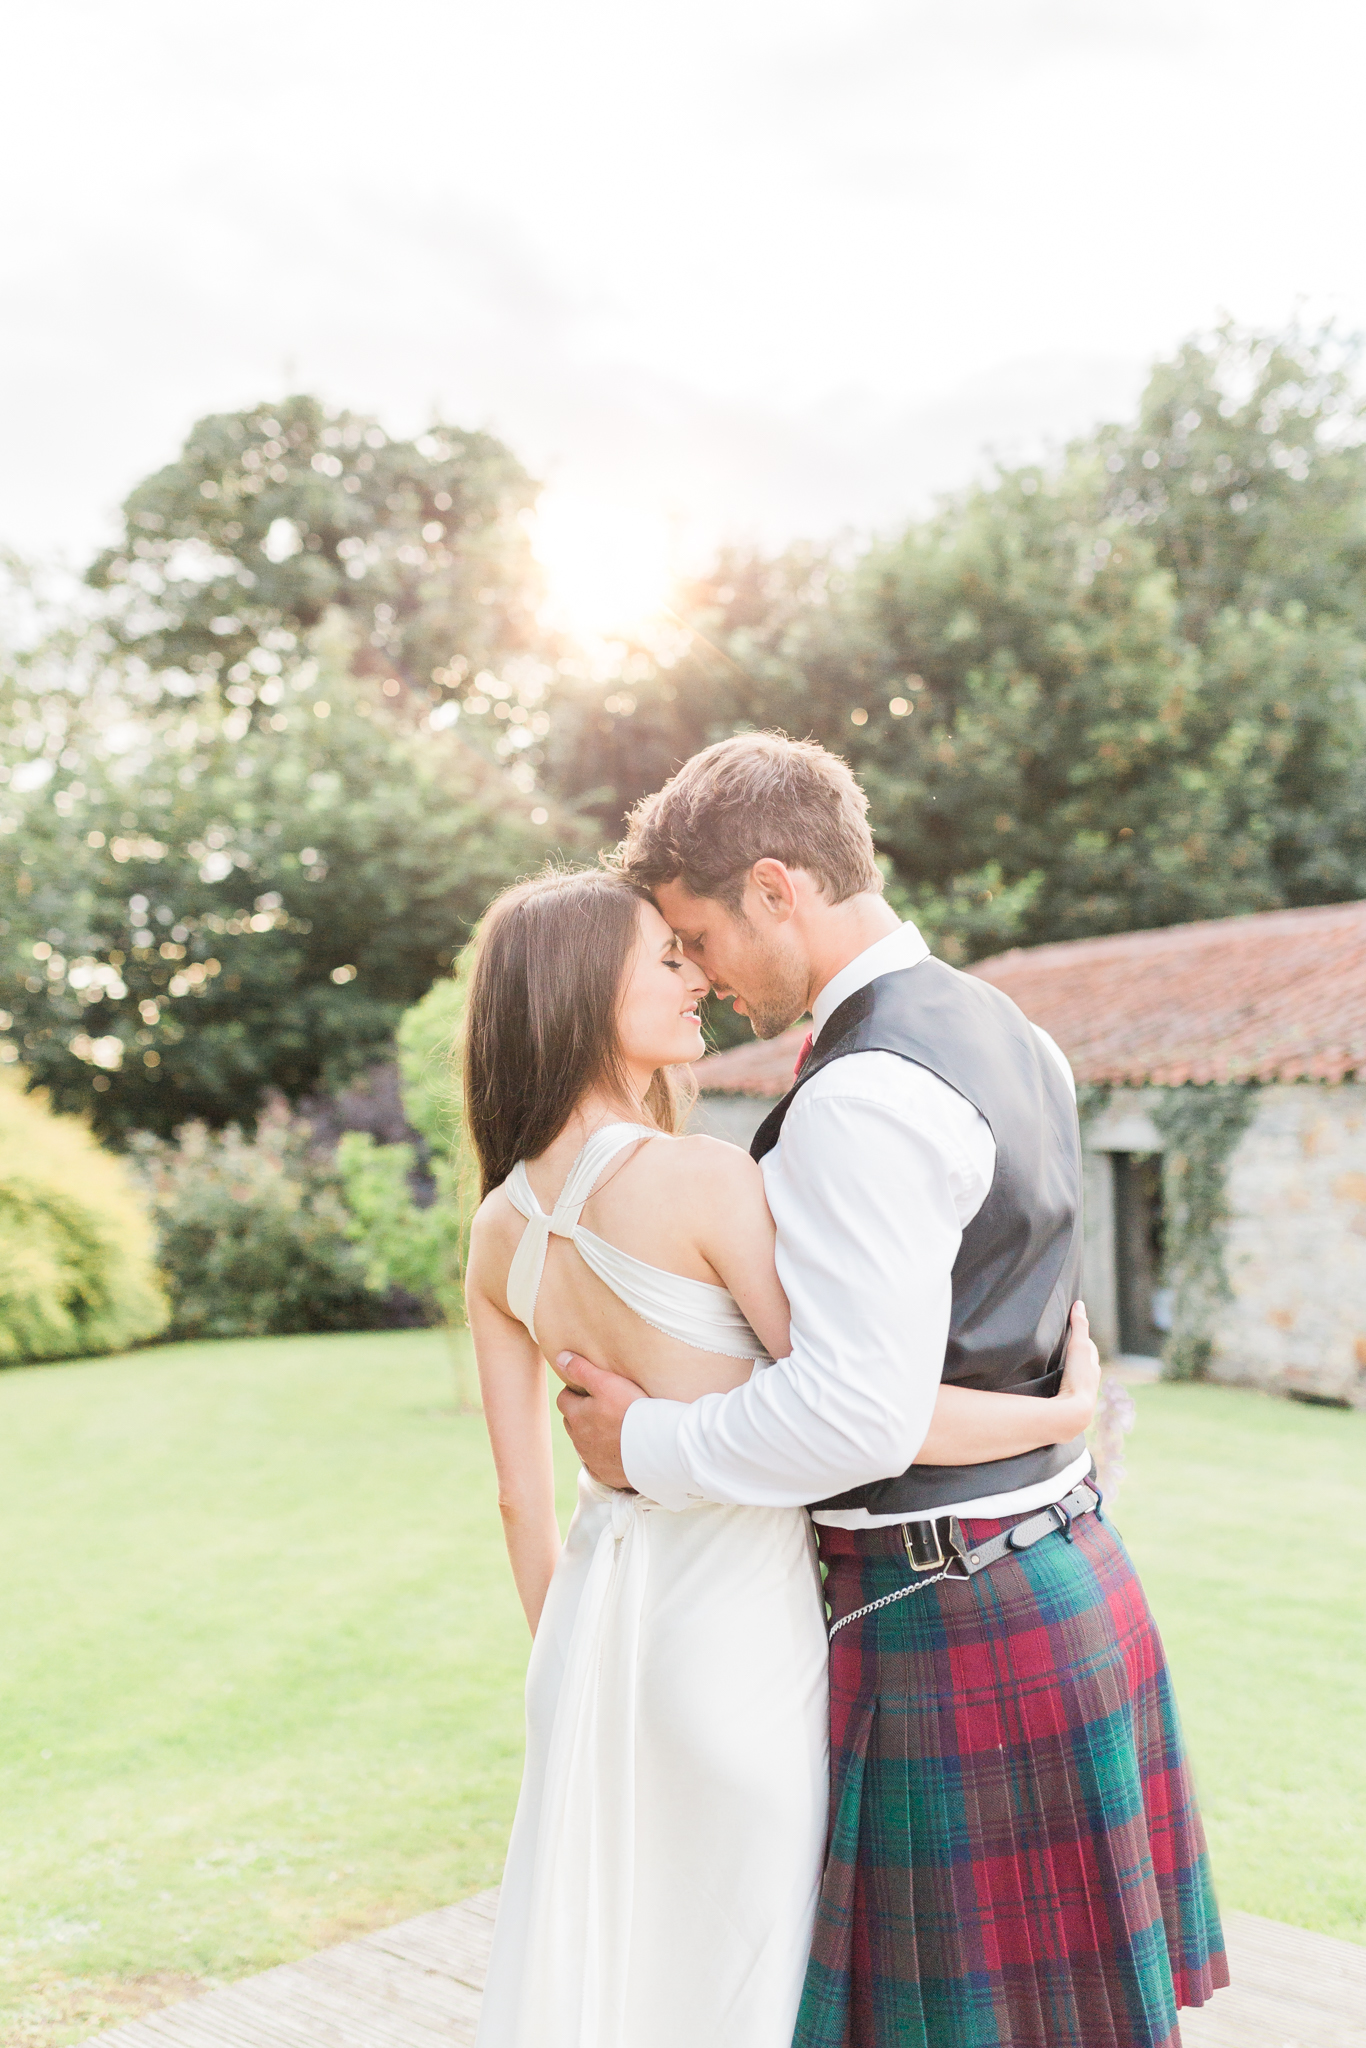 suzanne_li_photography_windmill_barn_wedding-9.jpg